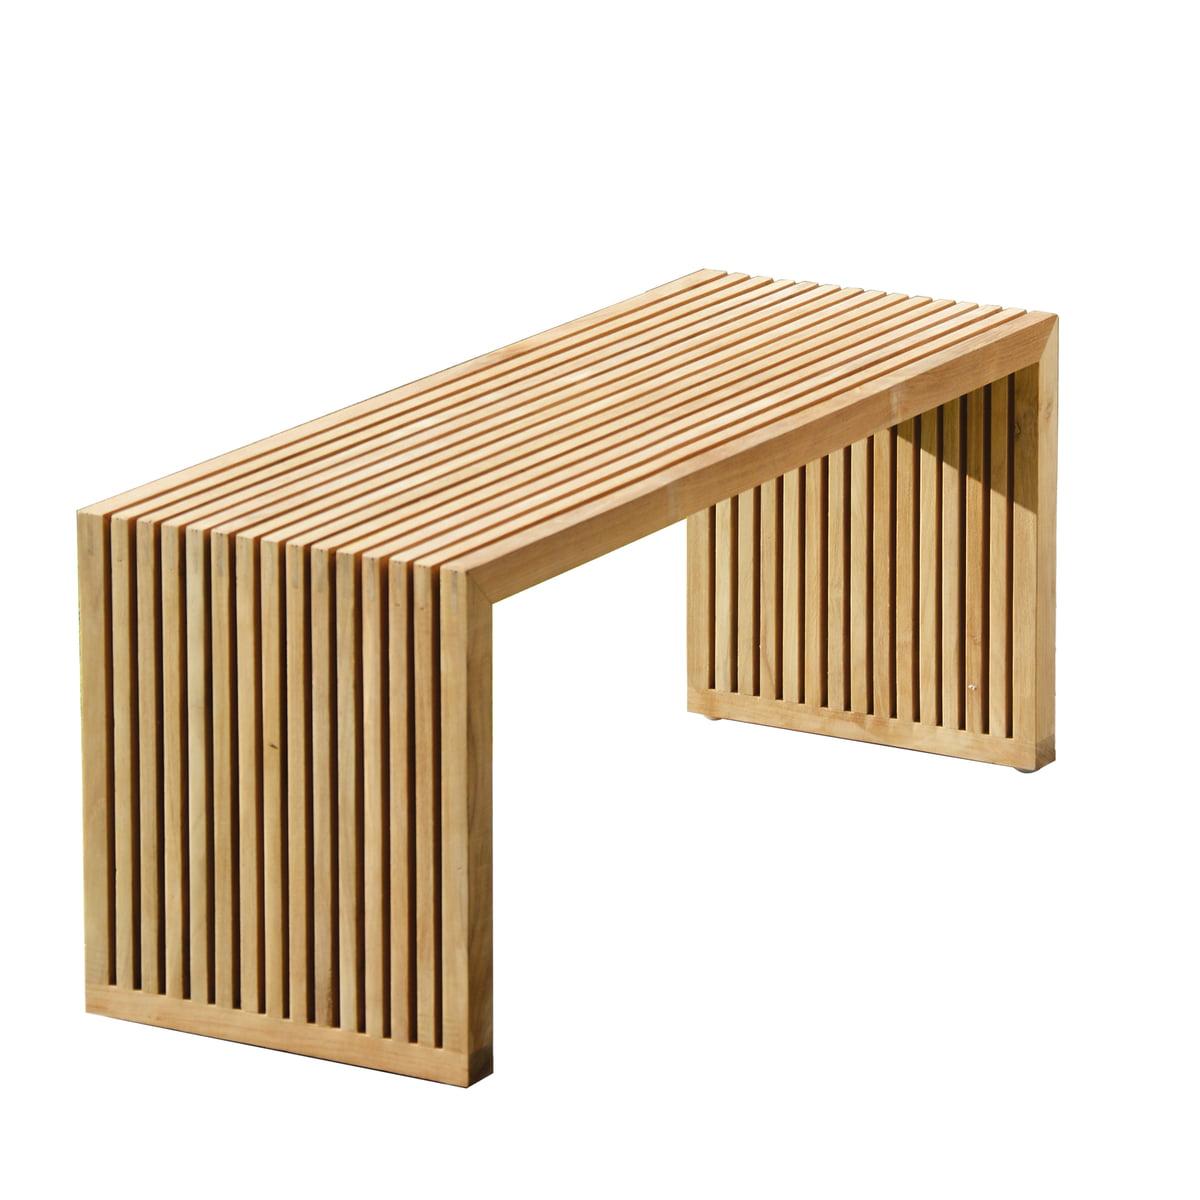 tivoli bank von jan kurtz connox shop. Black Bedroom Furniture Sets. Home Design Ideas